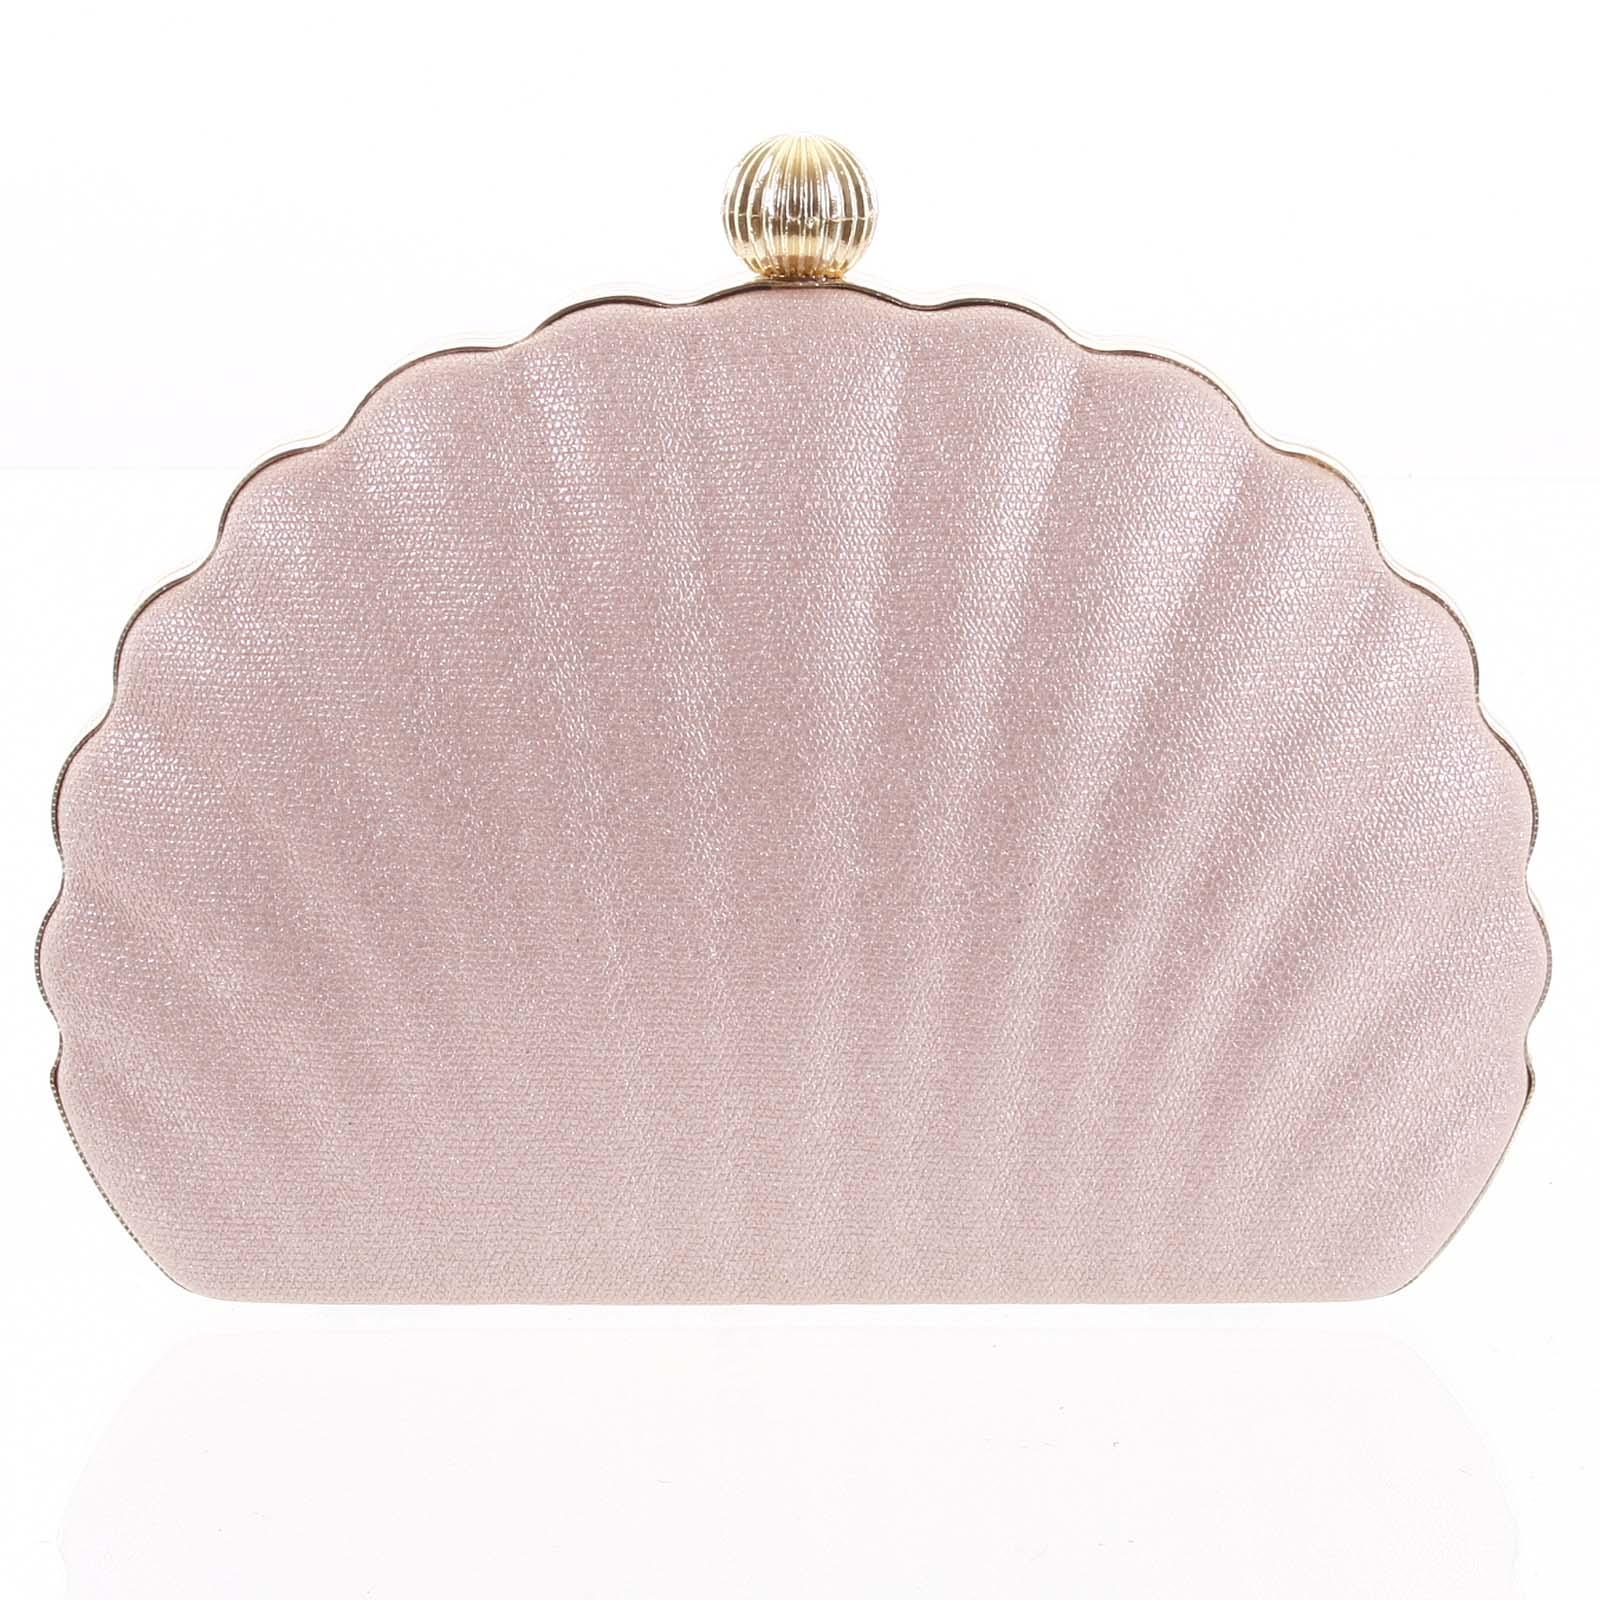 Dámska listová kabelka ružová - Michelle Moon Seashell ružová